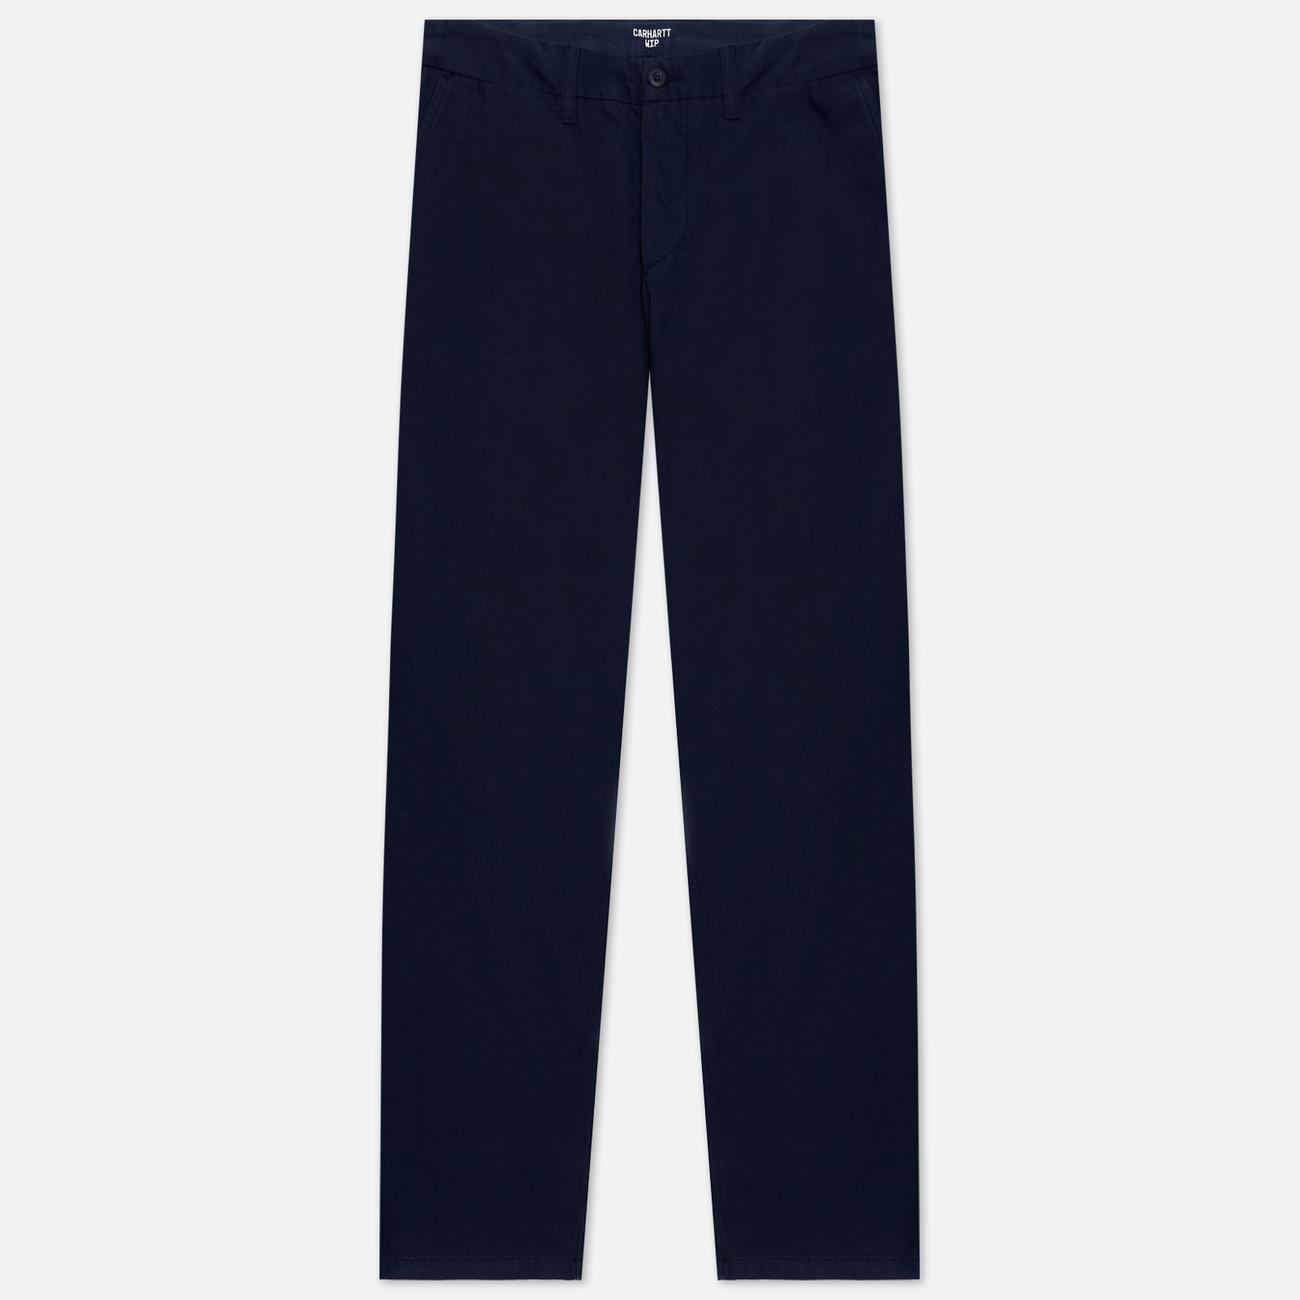 Мужские брюки Carhartt WIP Johnson Twill 8.4 Oz Dark Navy